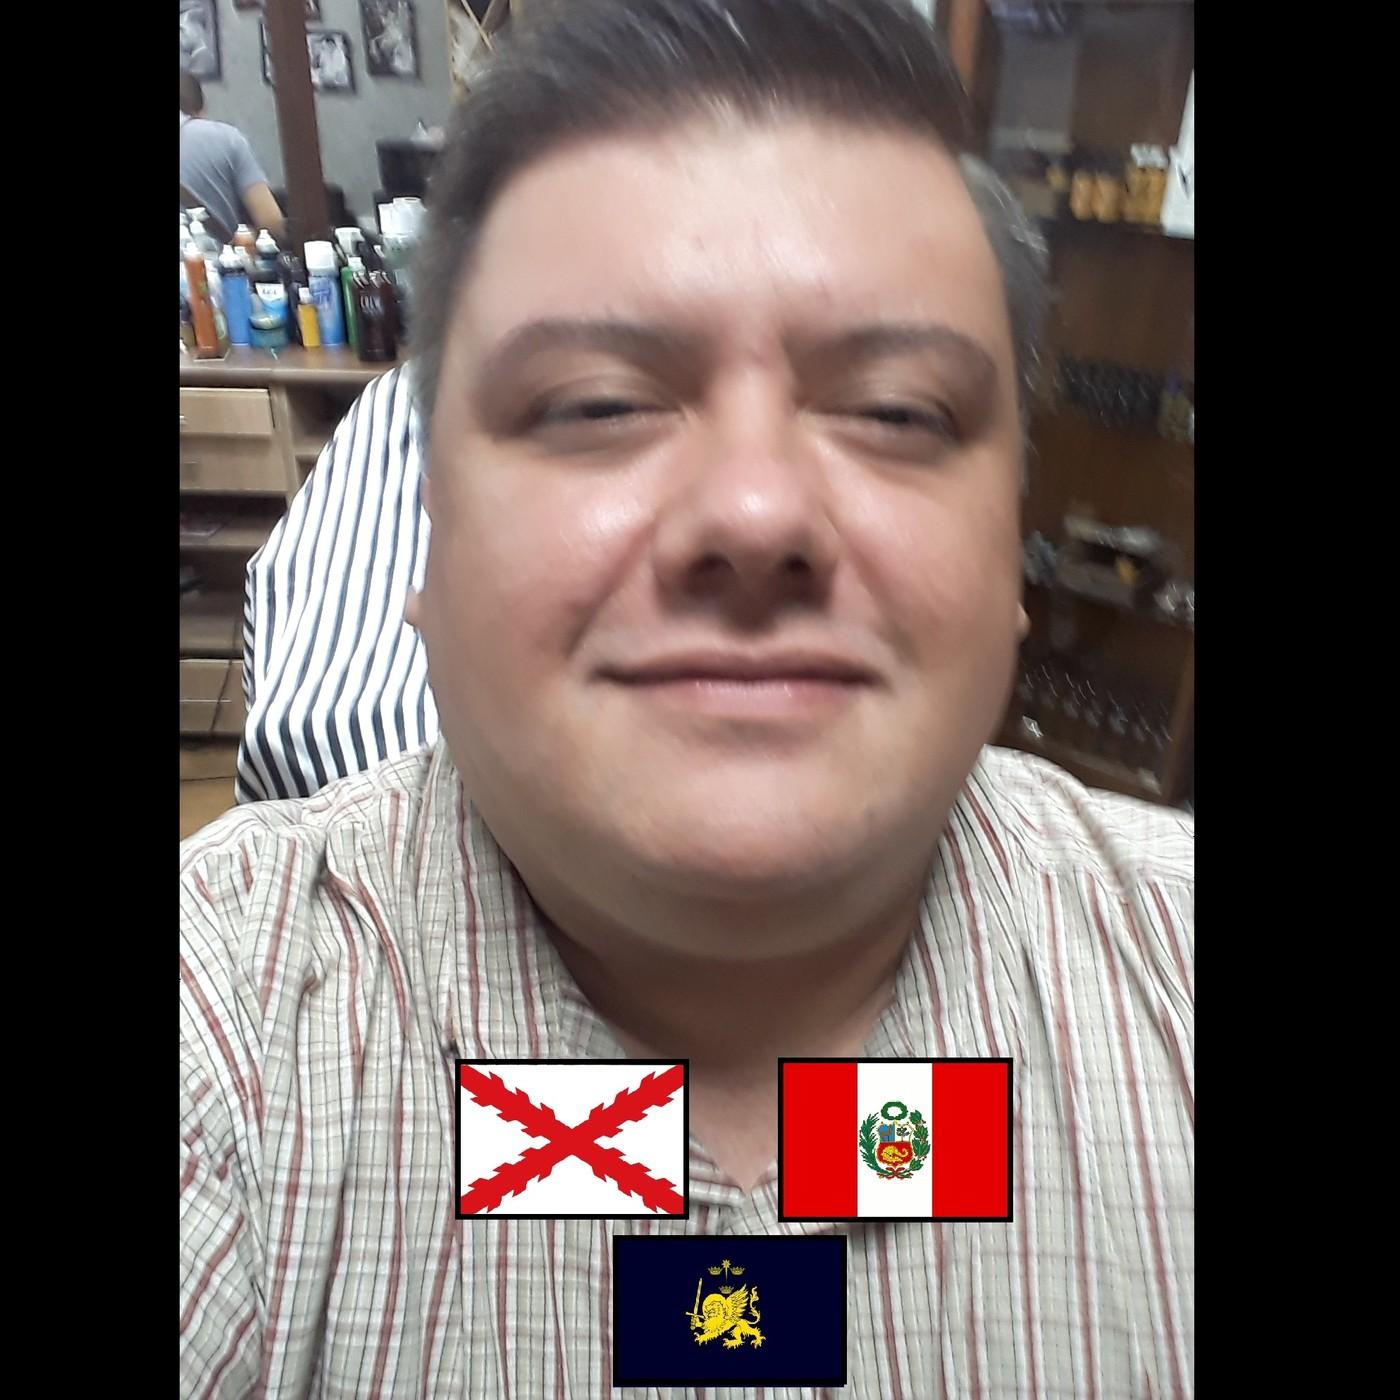 Marcos Vásquez Mazzotti